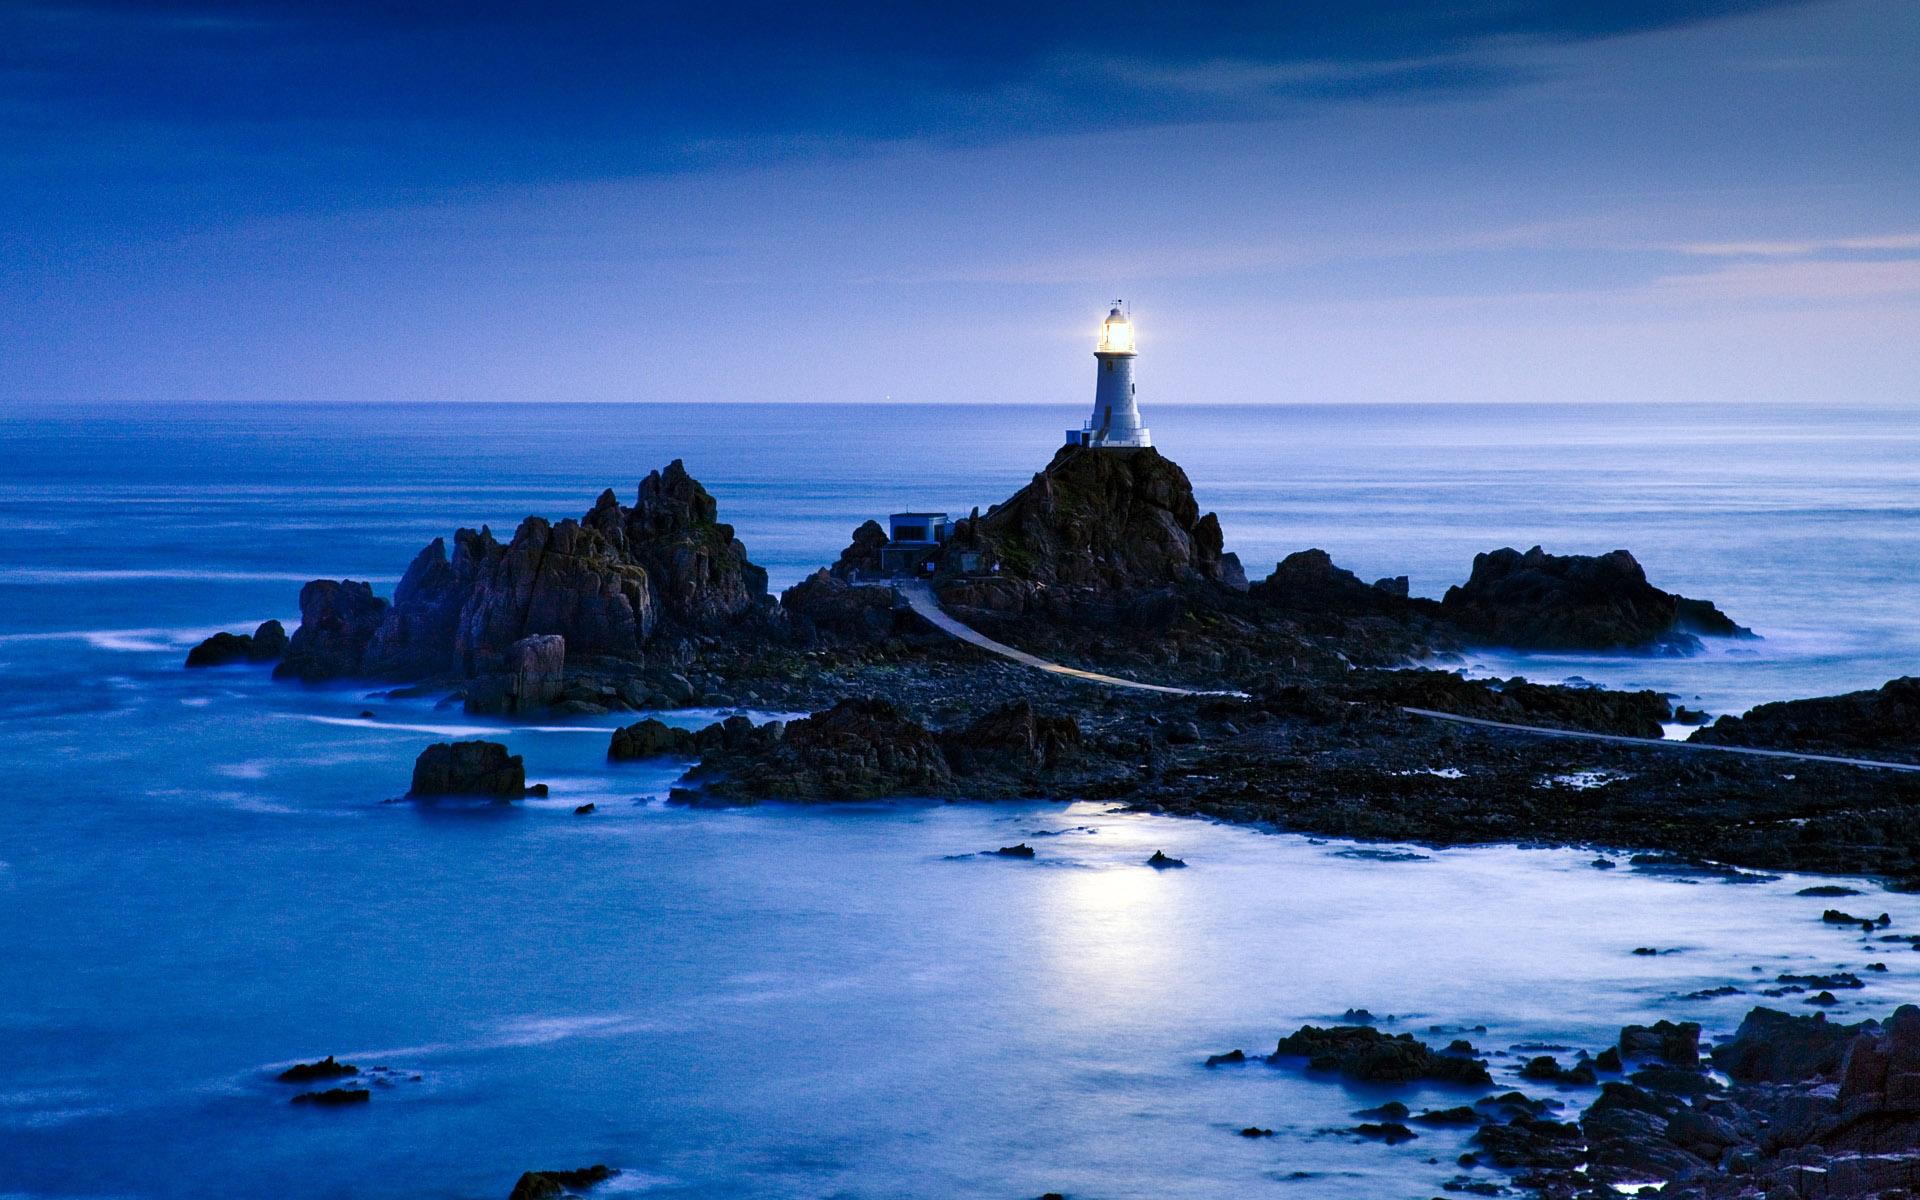 La Corbière Lighthouse, Jersey, Channel Islands, UK